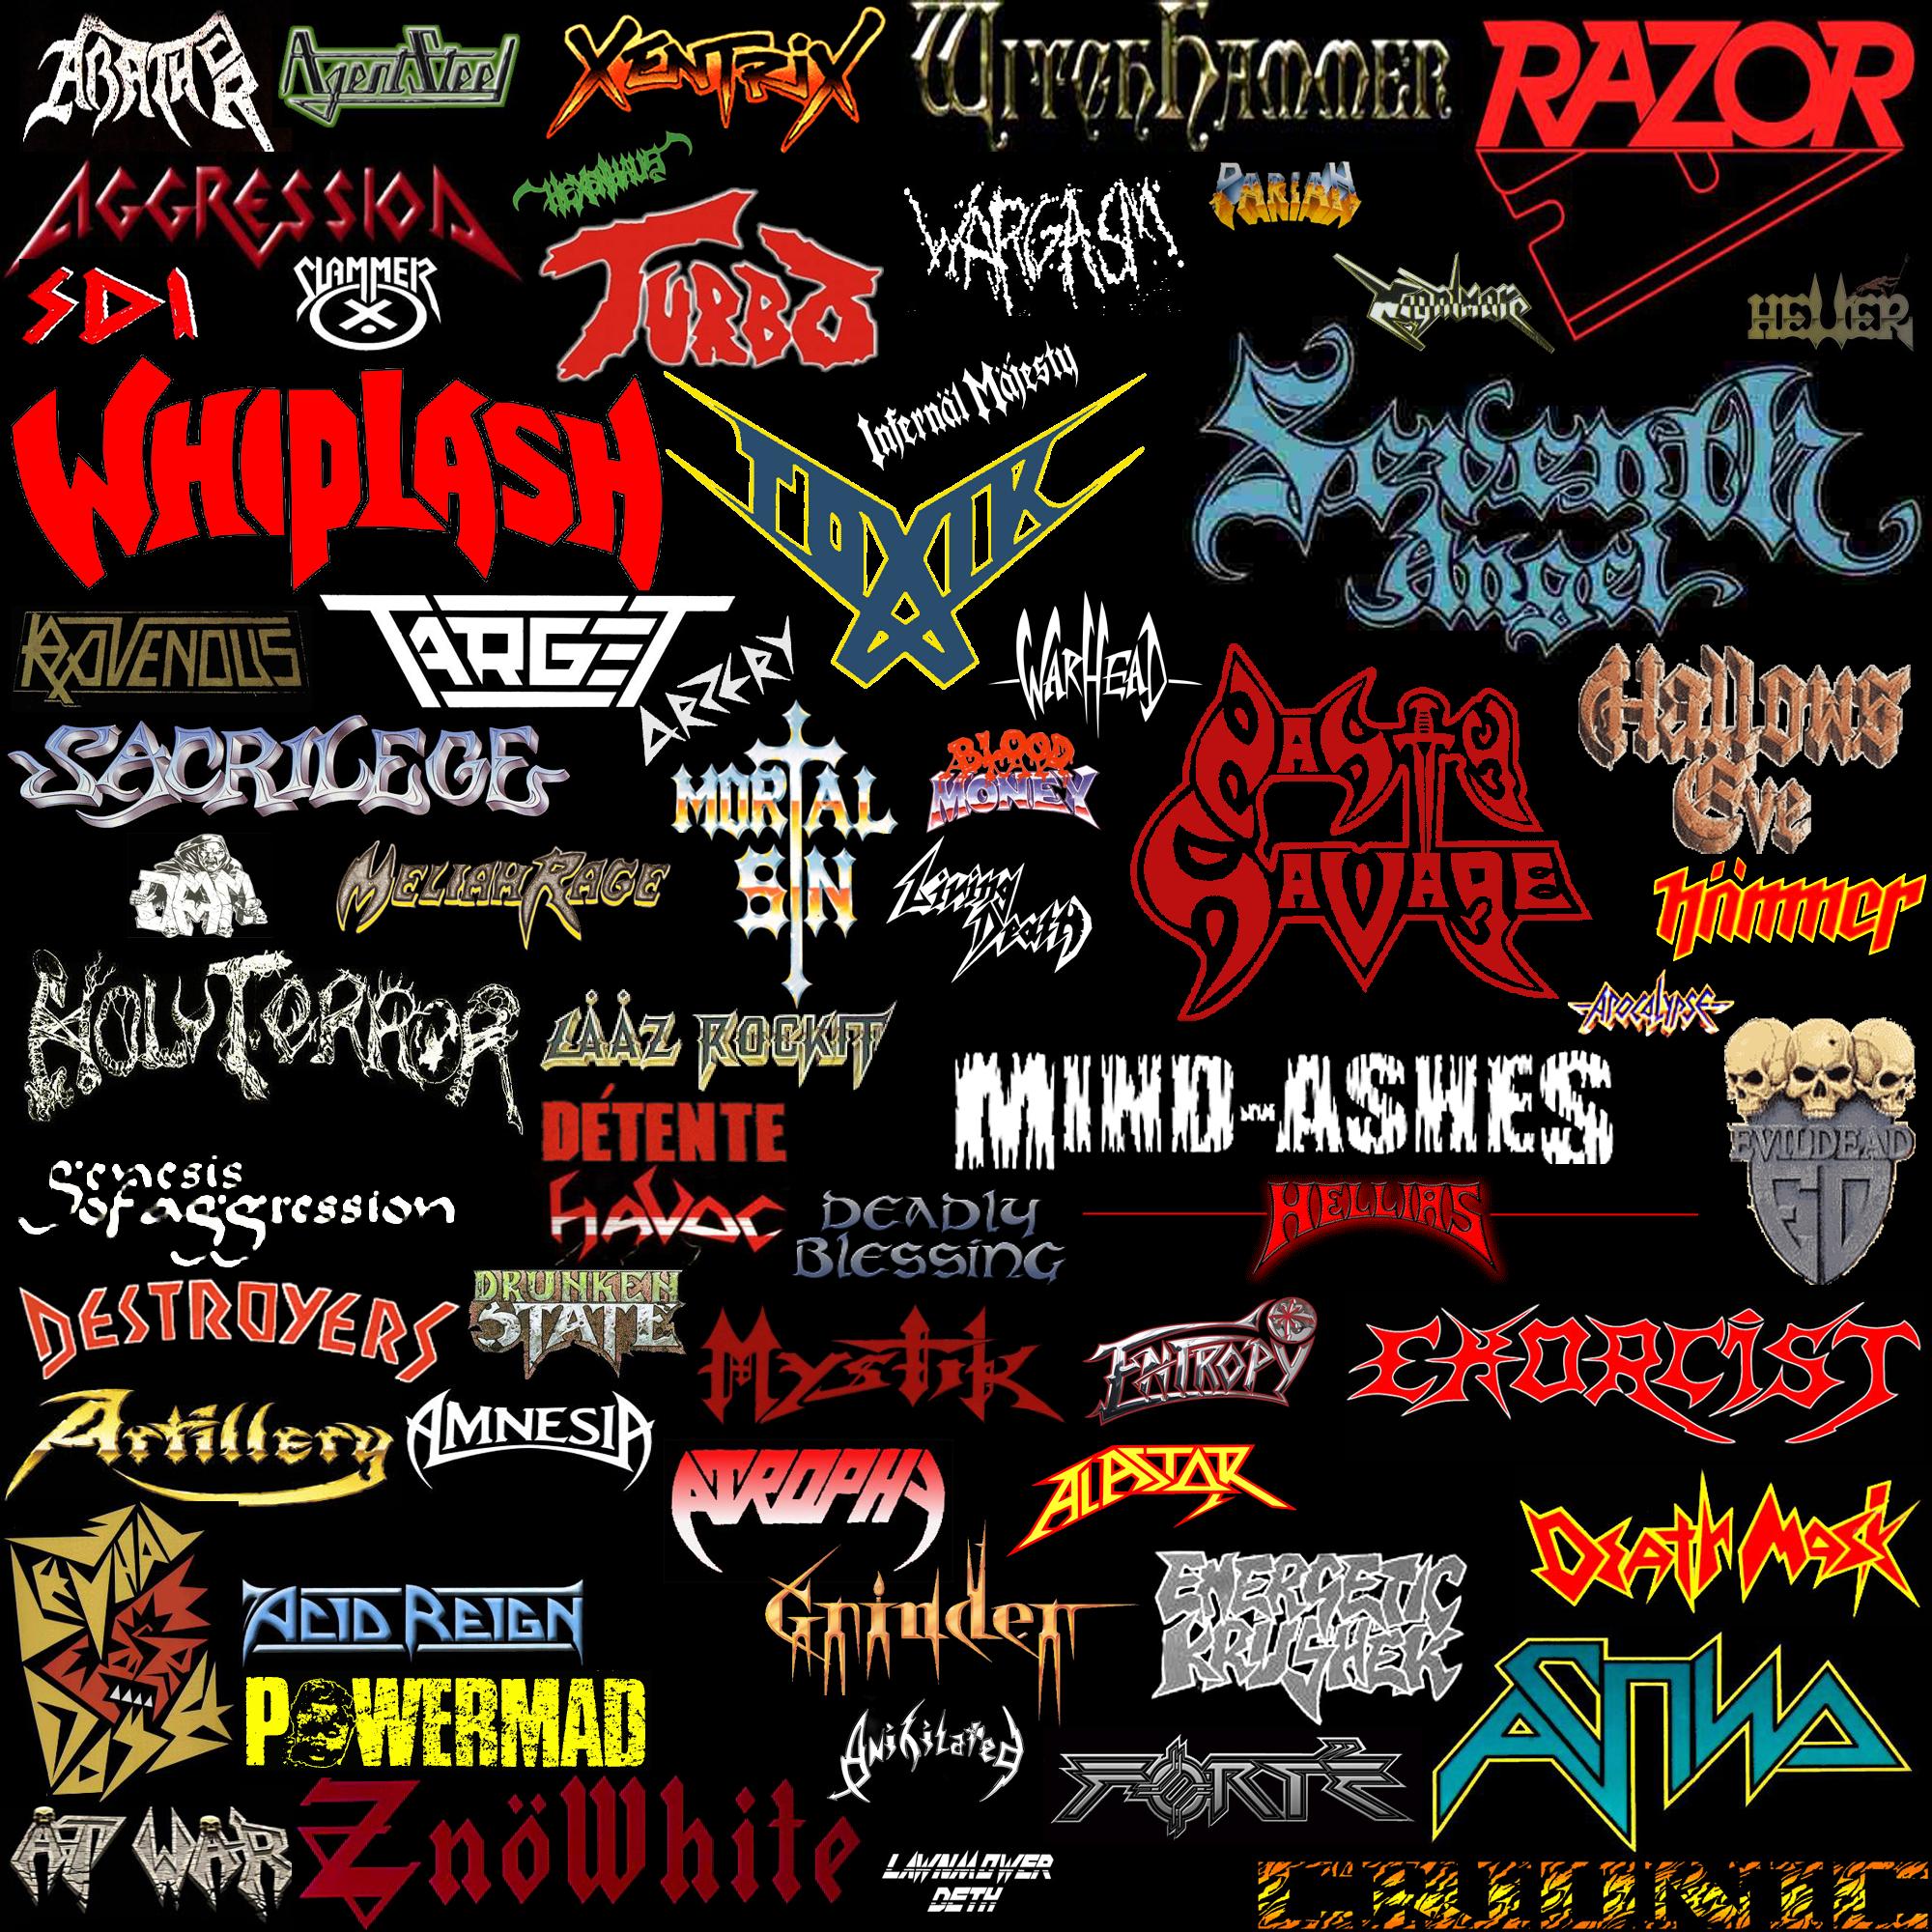 thrash metal | Obscure Thrash Metal by ~Pathora on